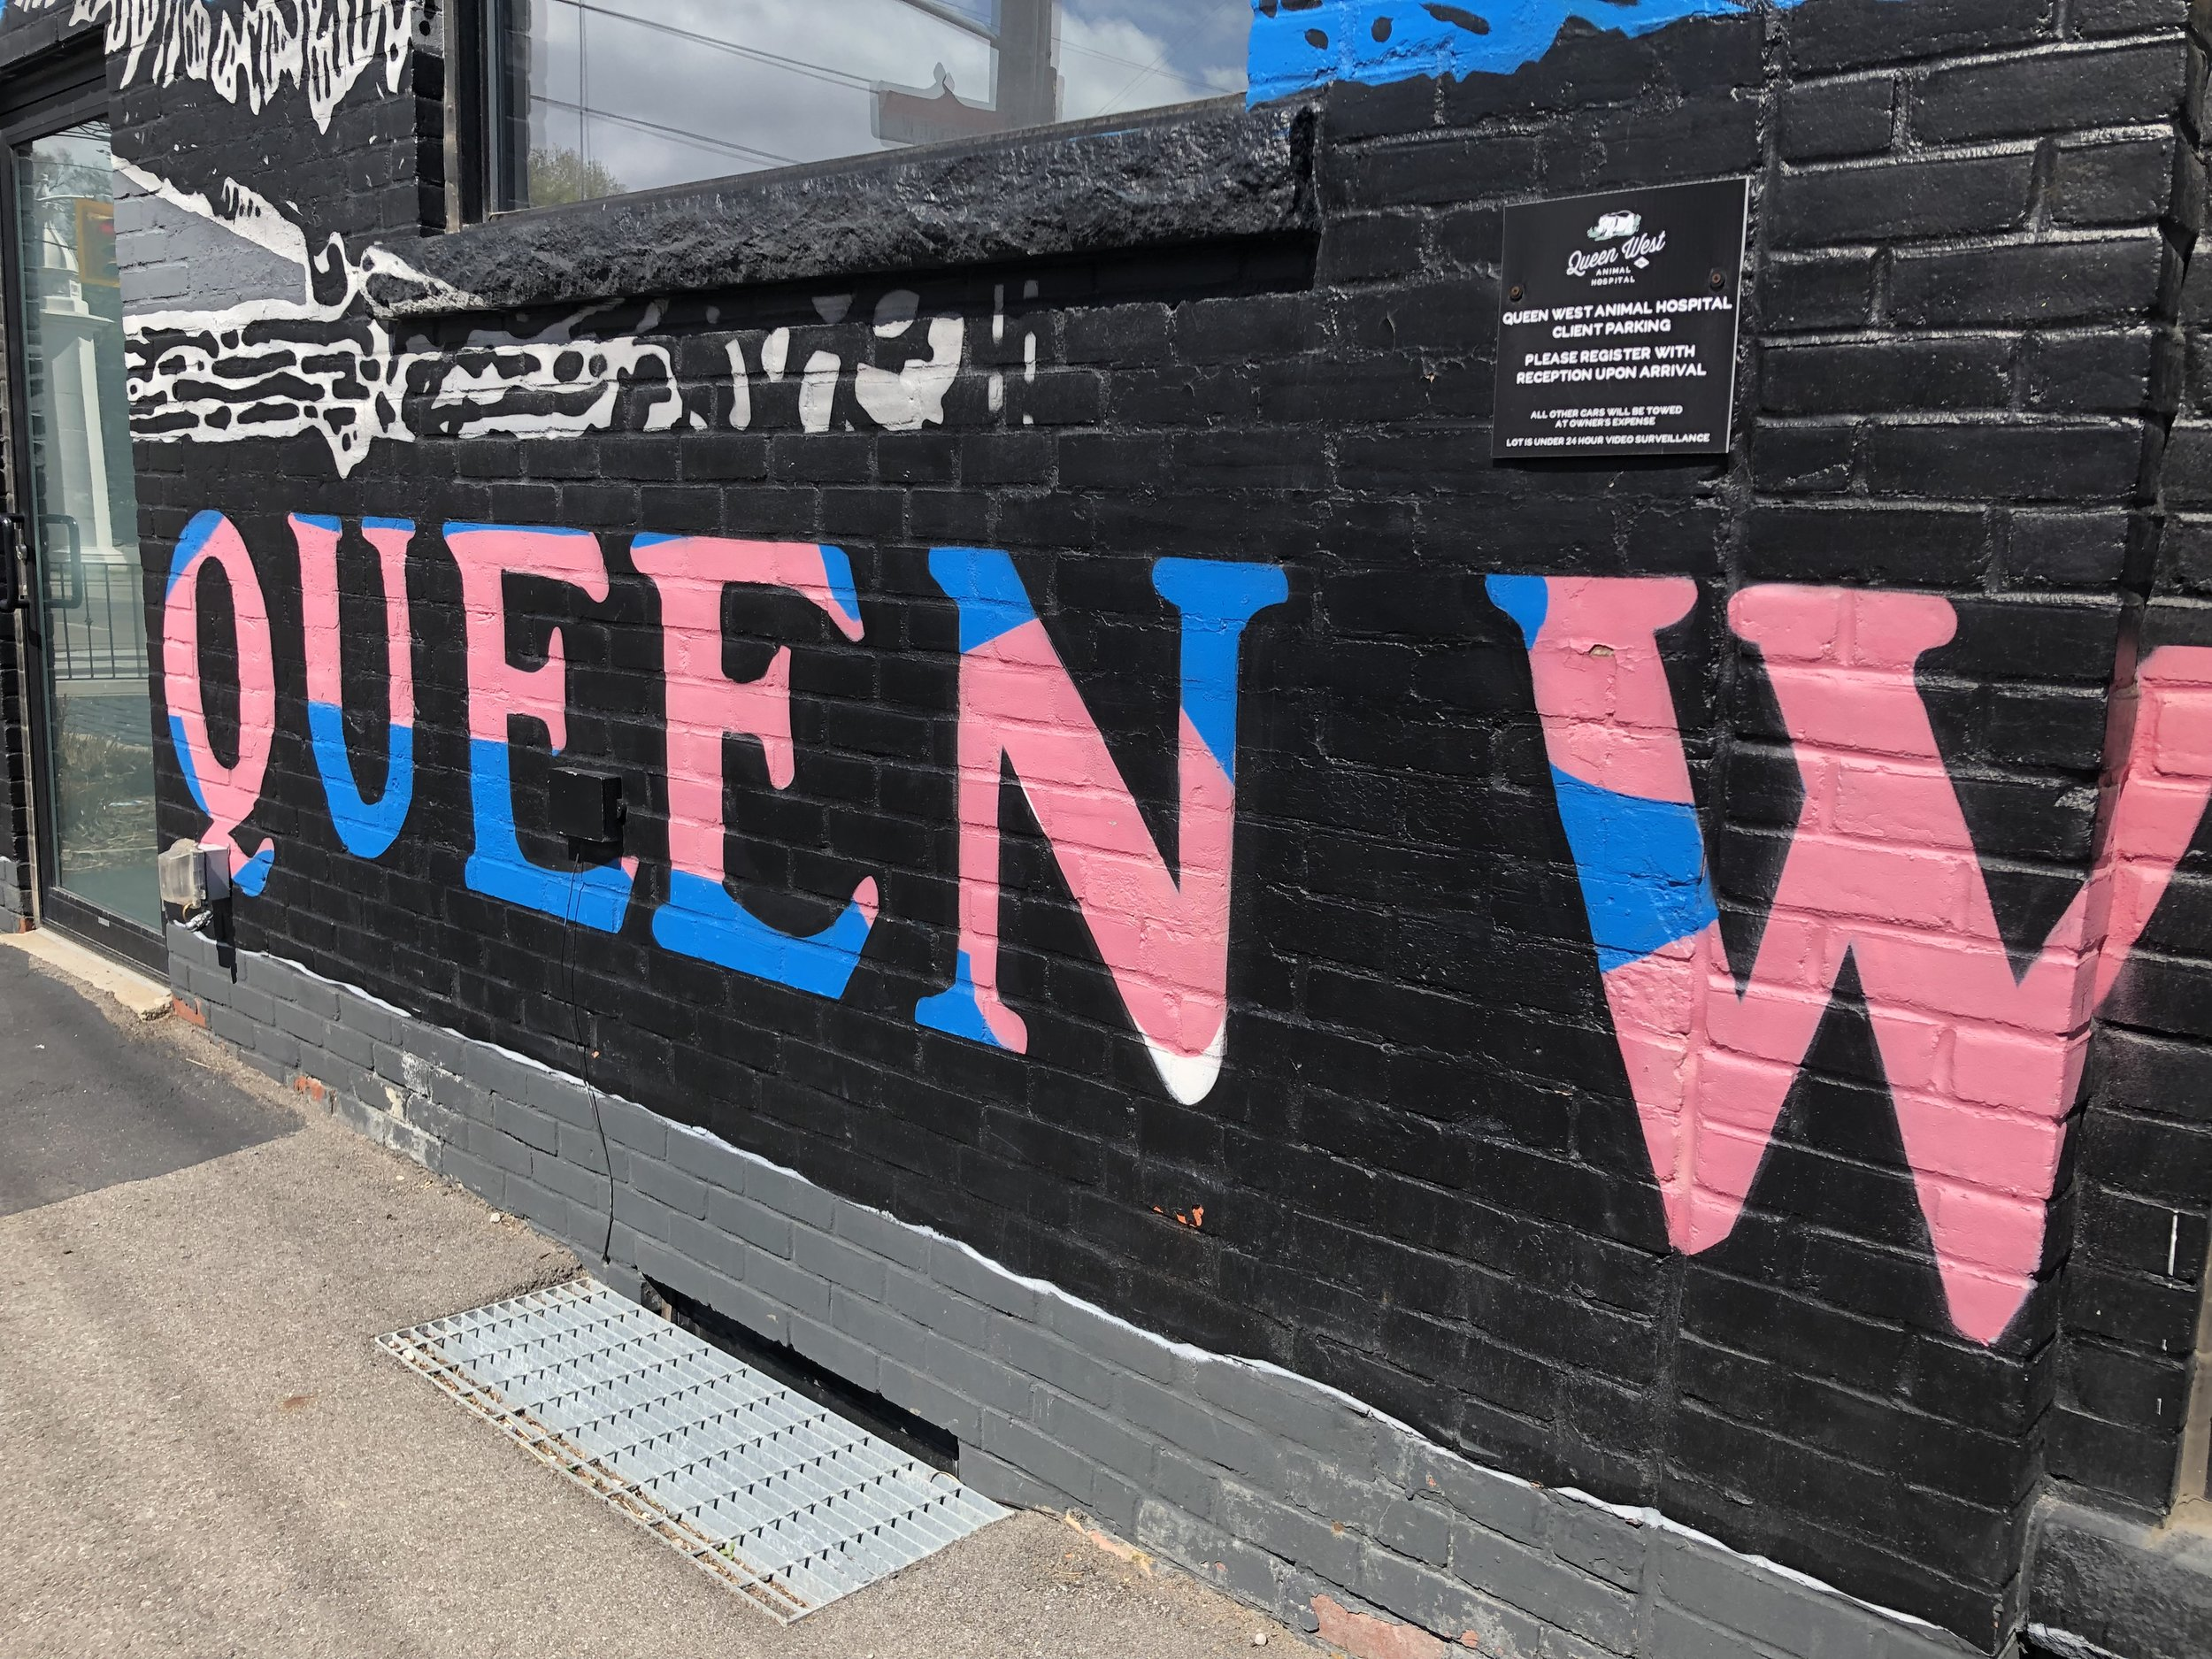 The street art along Queen St W is so interesting